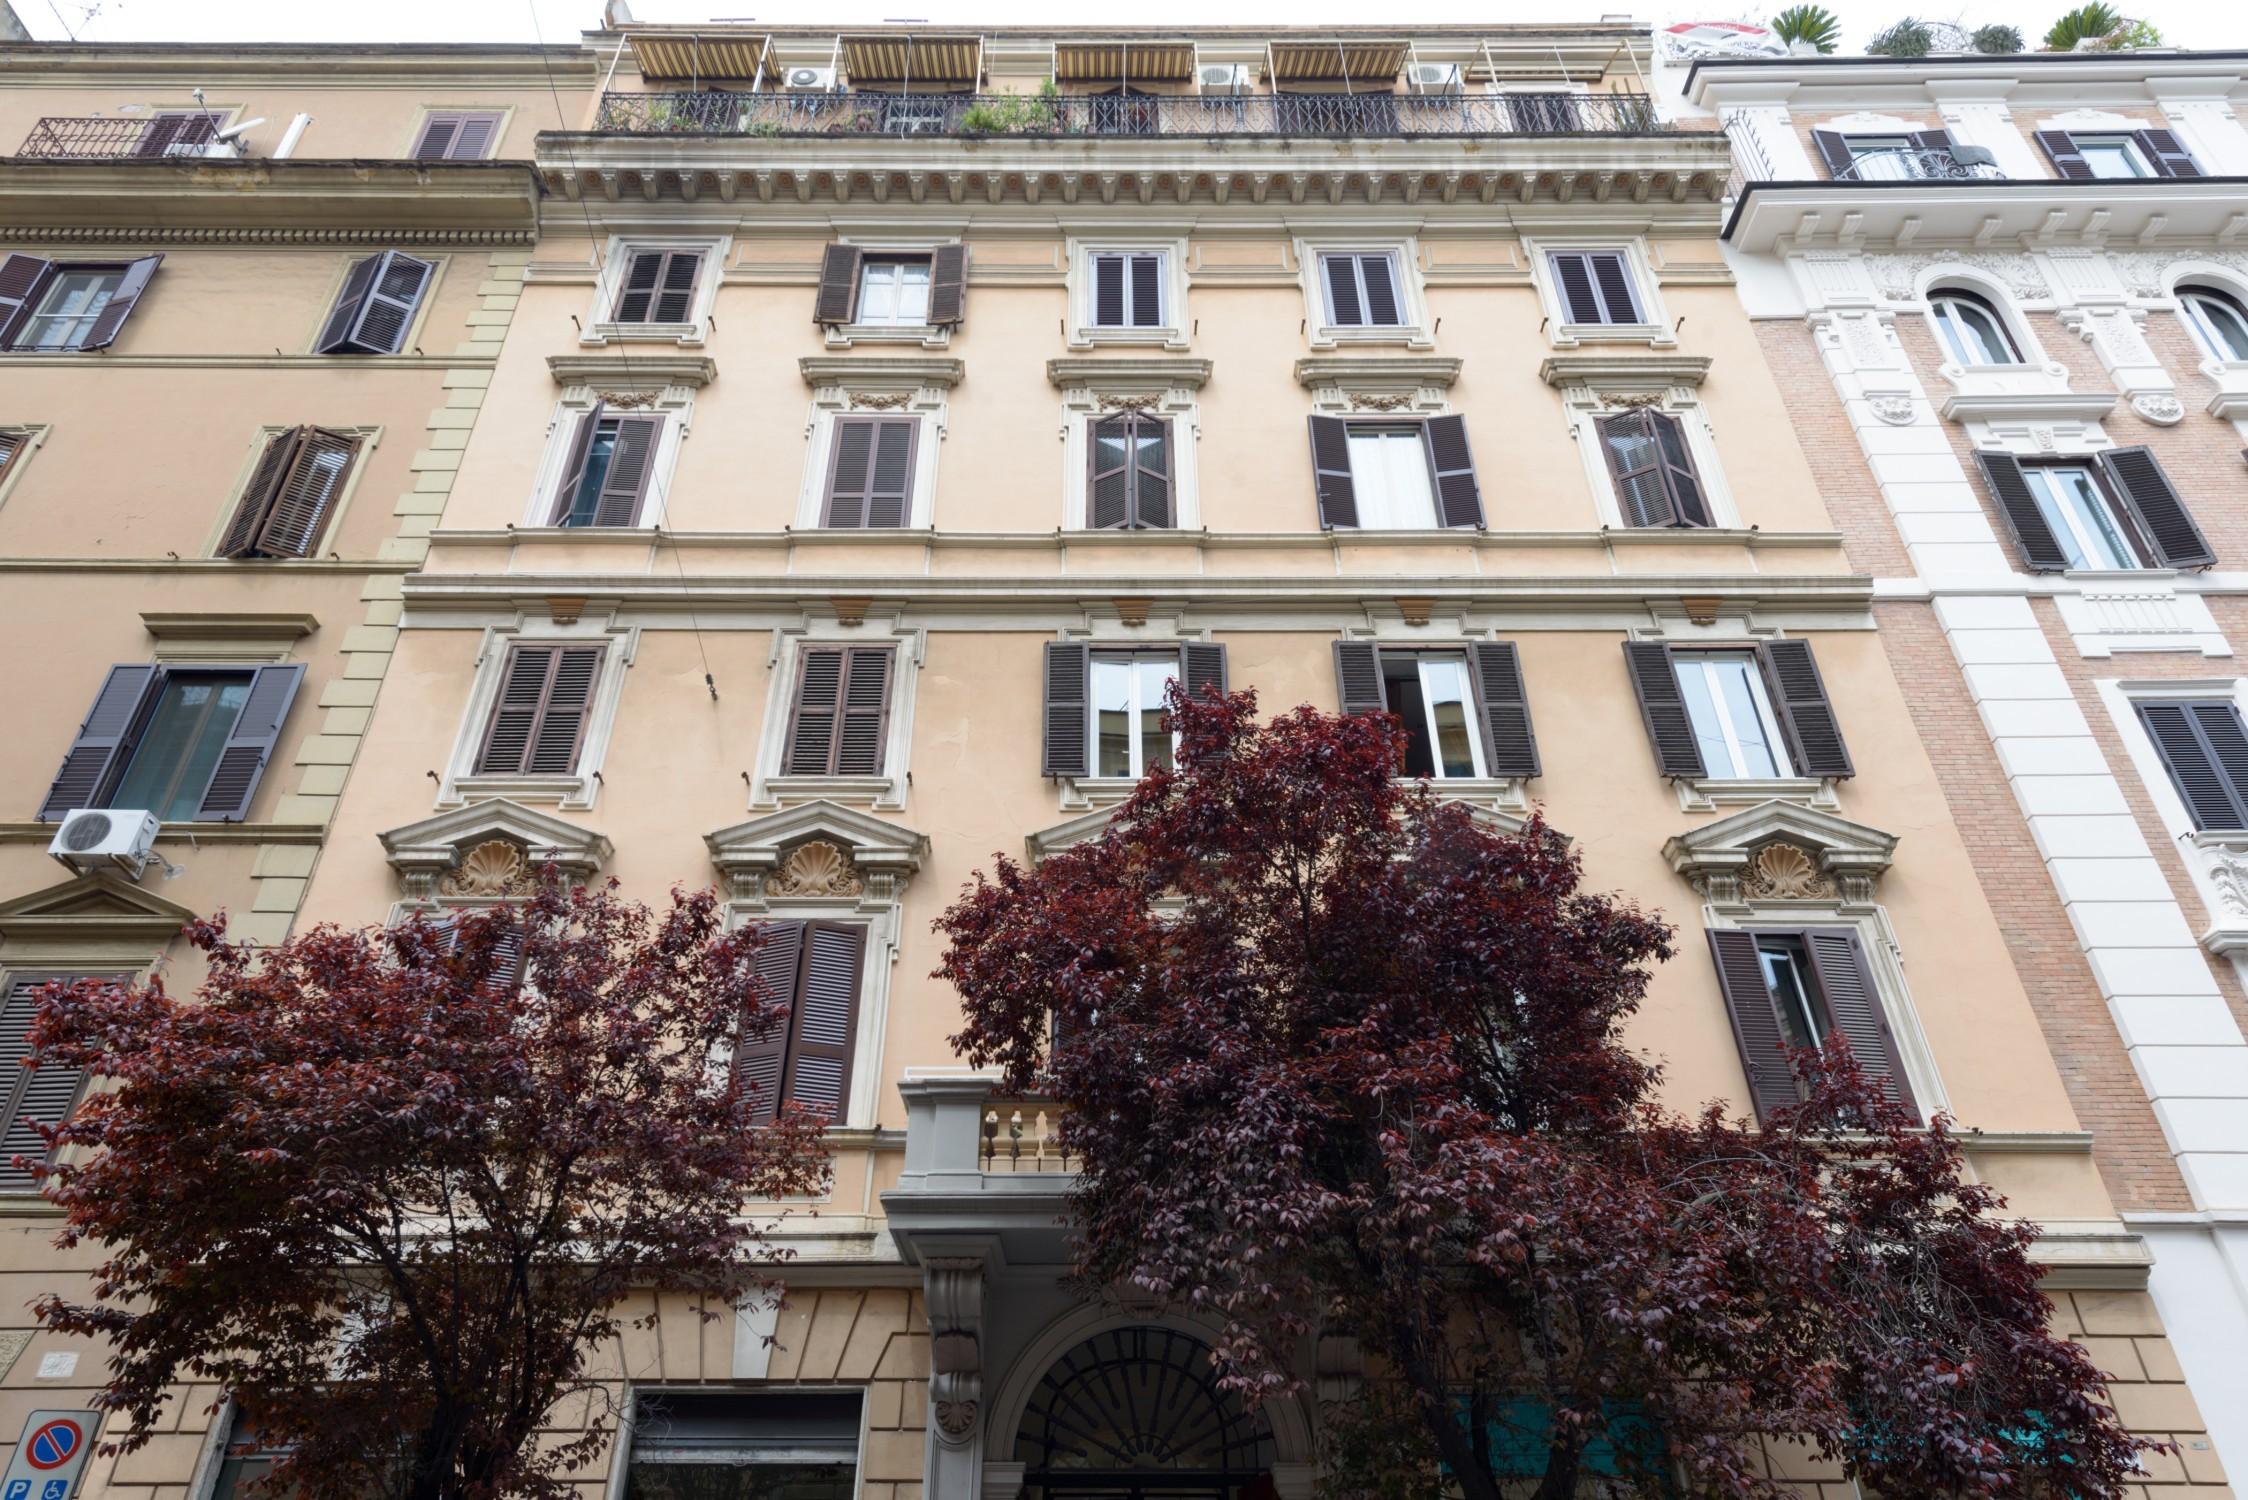 Rome's Heart Guest House Building